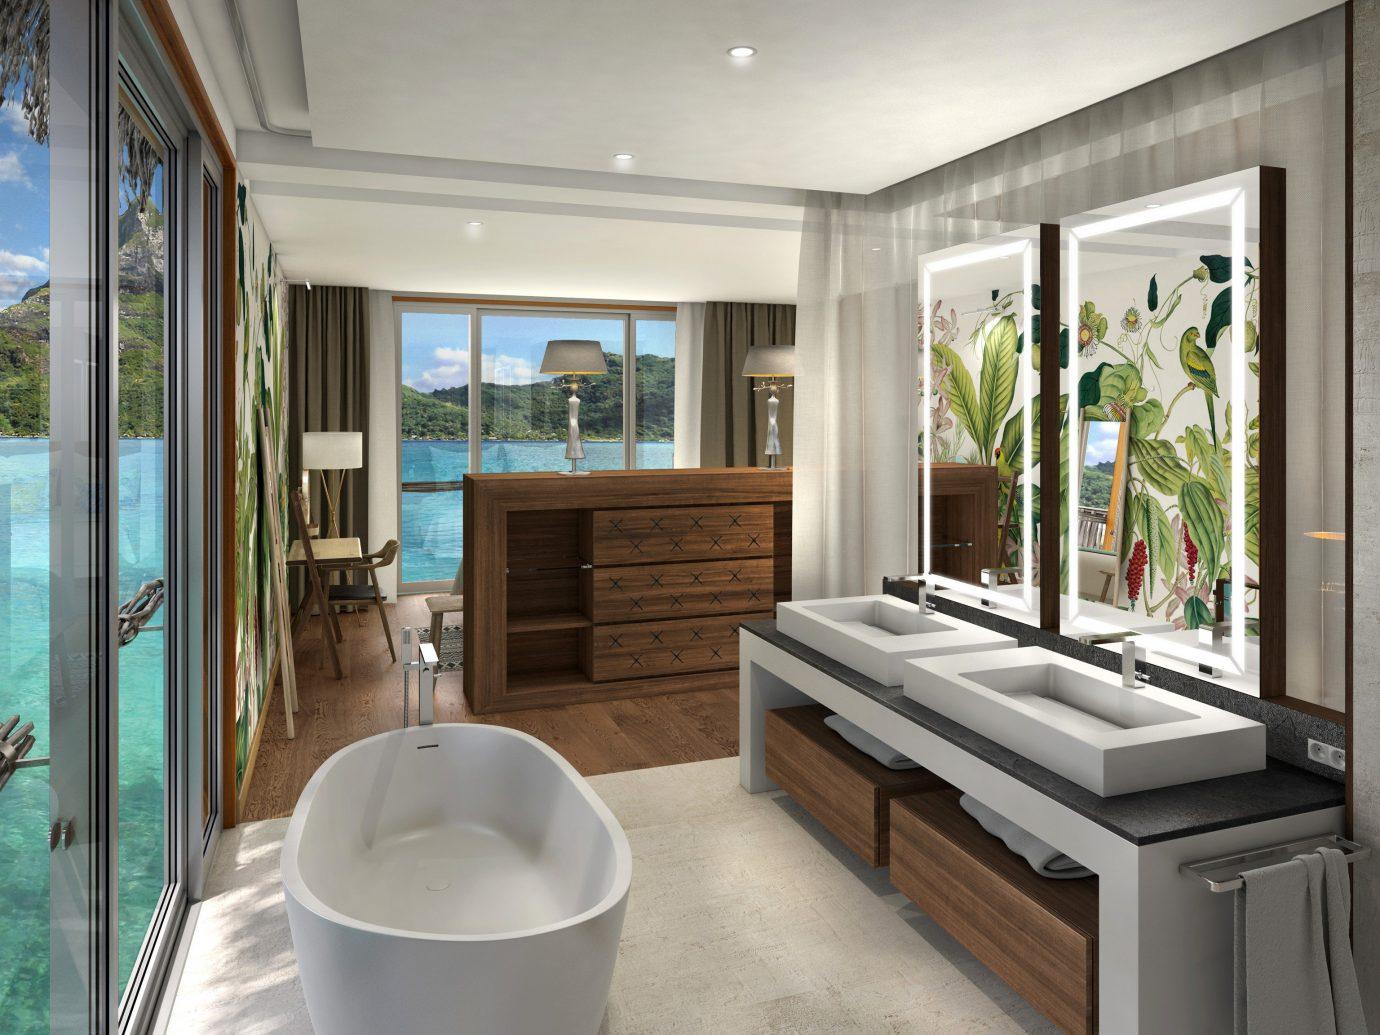 Hotels window indoor property ceiling interior design real estate estate bathroom porch penthouse apartment tub bathtub Bath